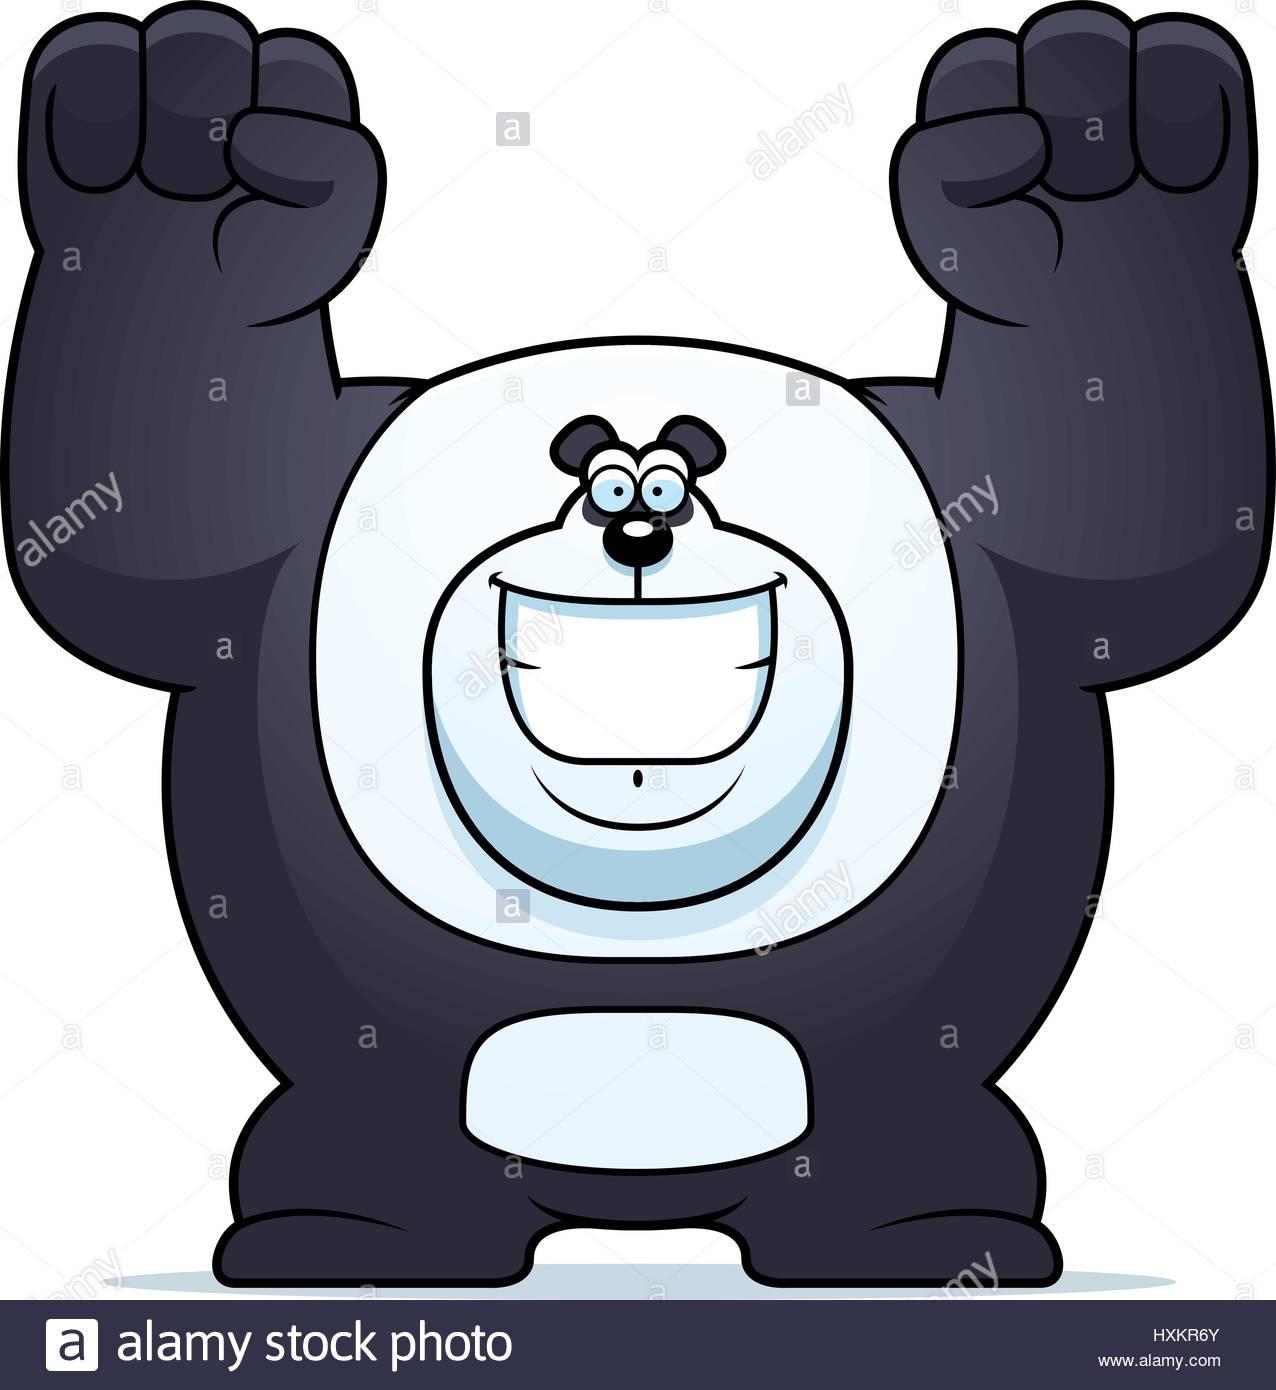 1276x1390 A Cartoon Illustration Of A Panda Bear Celebrating Stock Vector